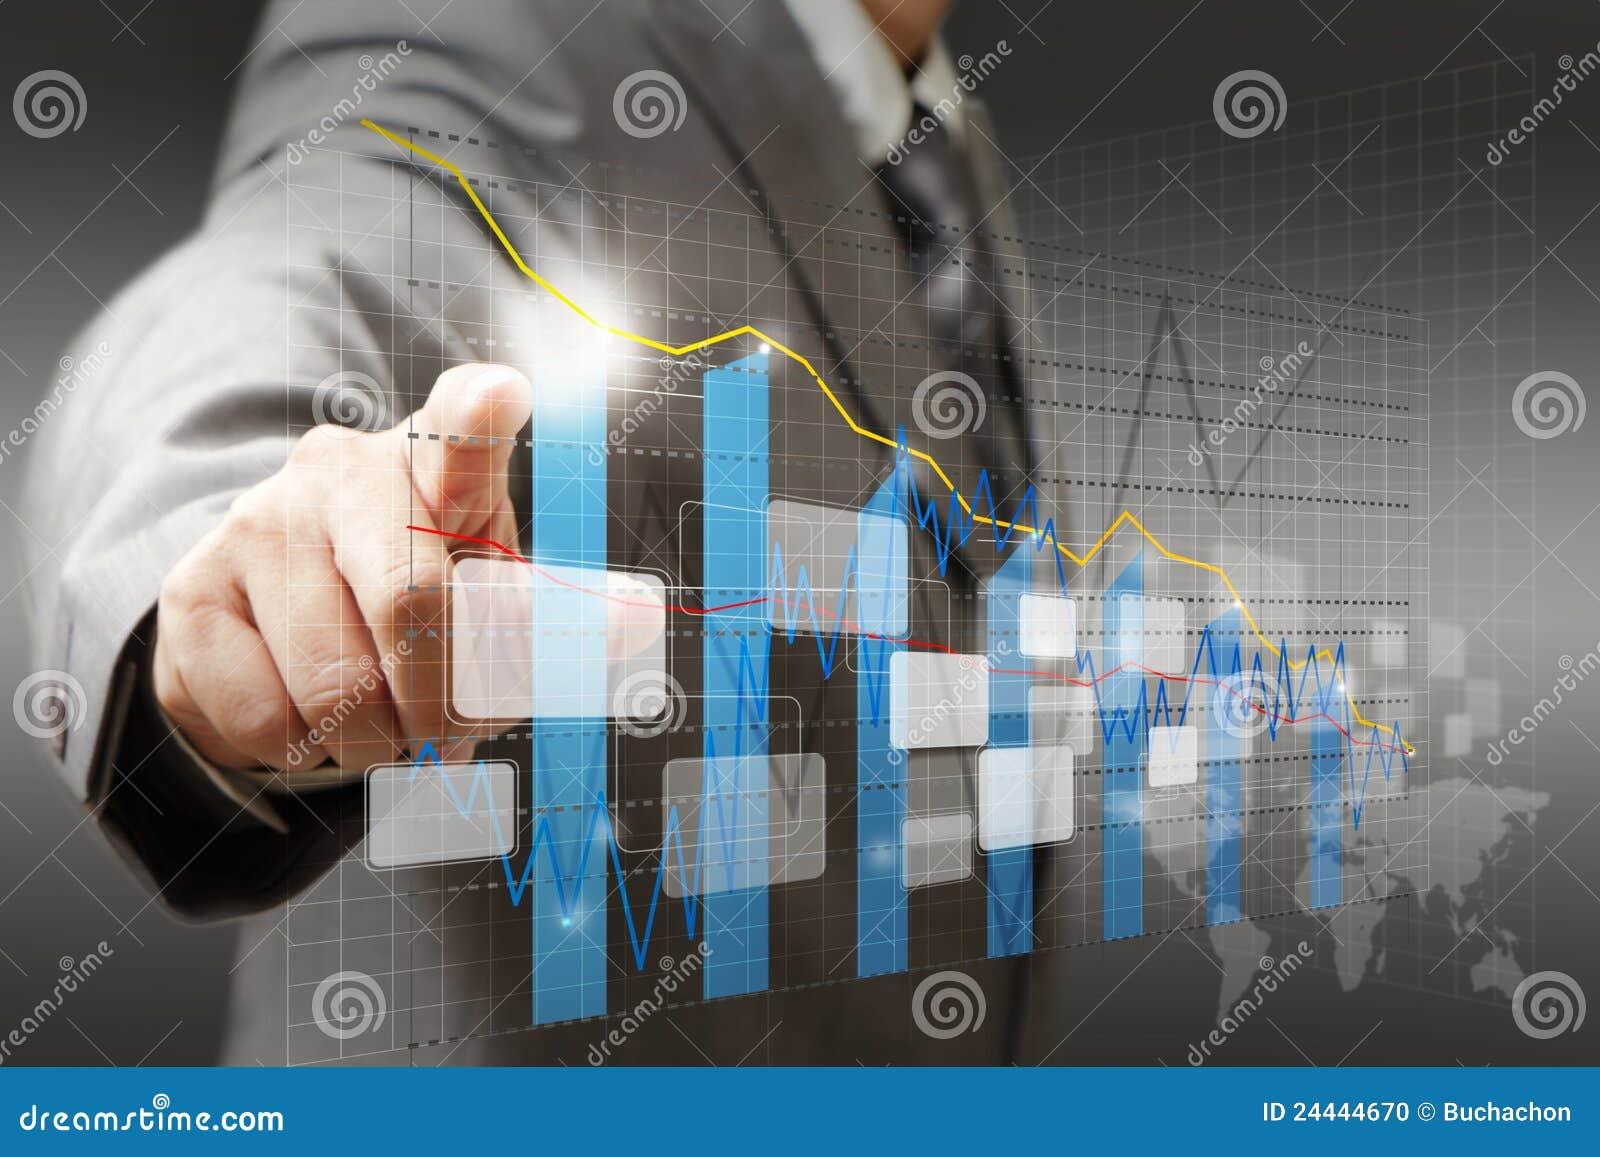 Graphique virtuel de contact, diagramme